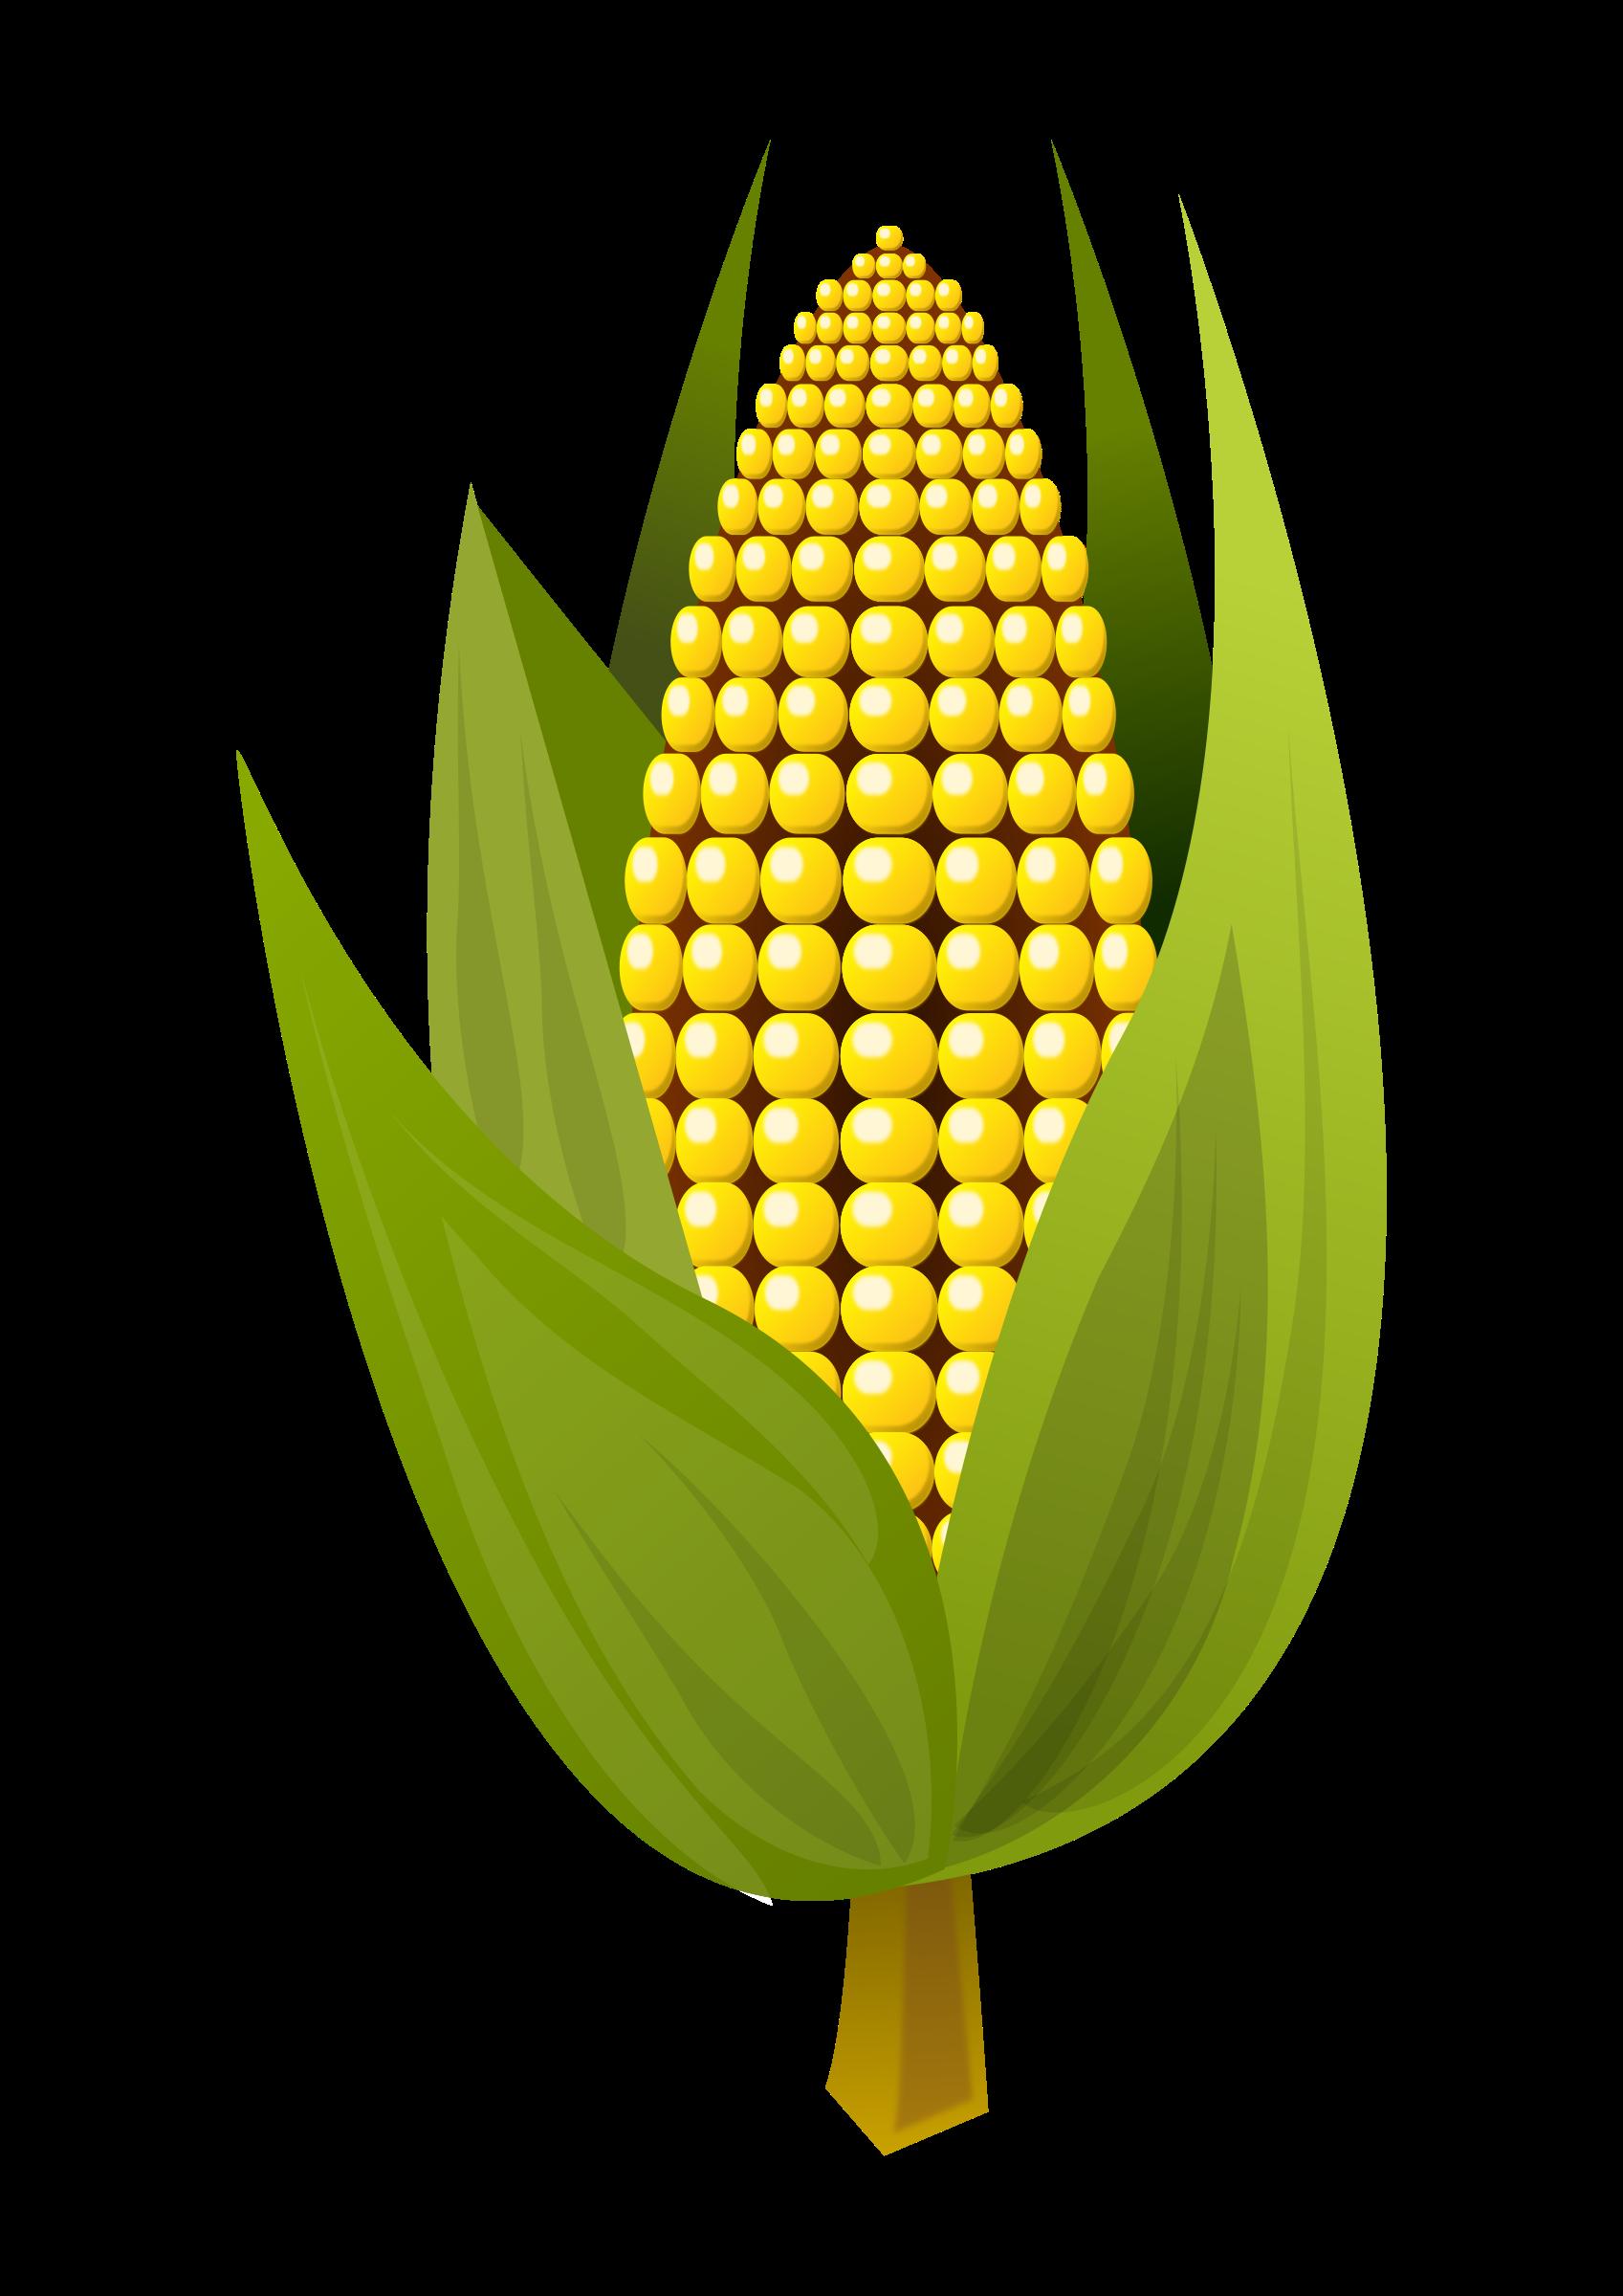 Corn by Almeidah